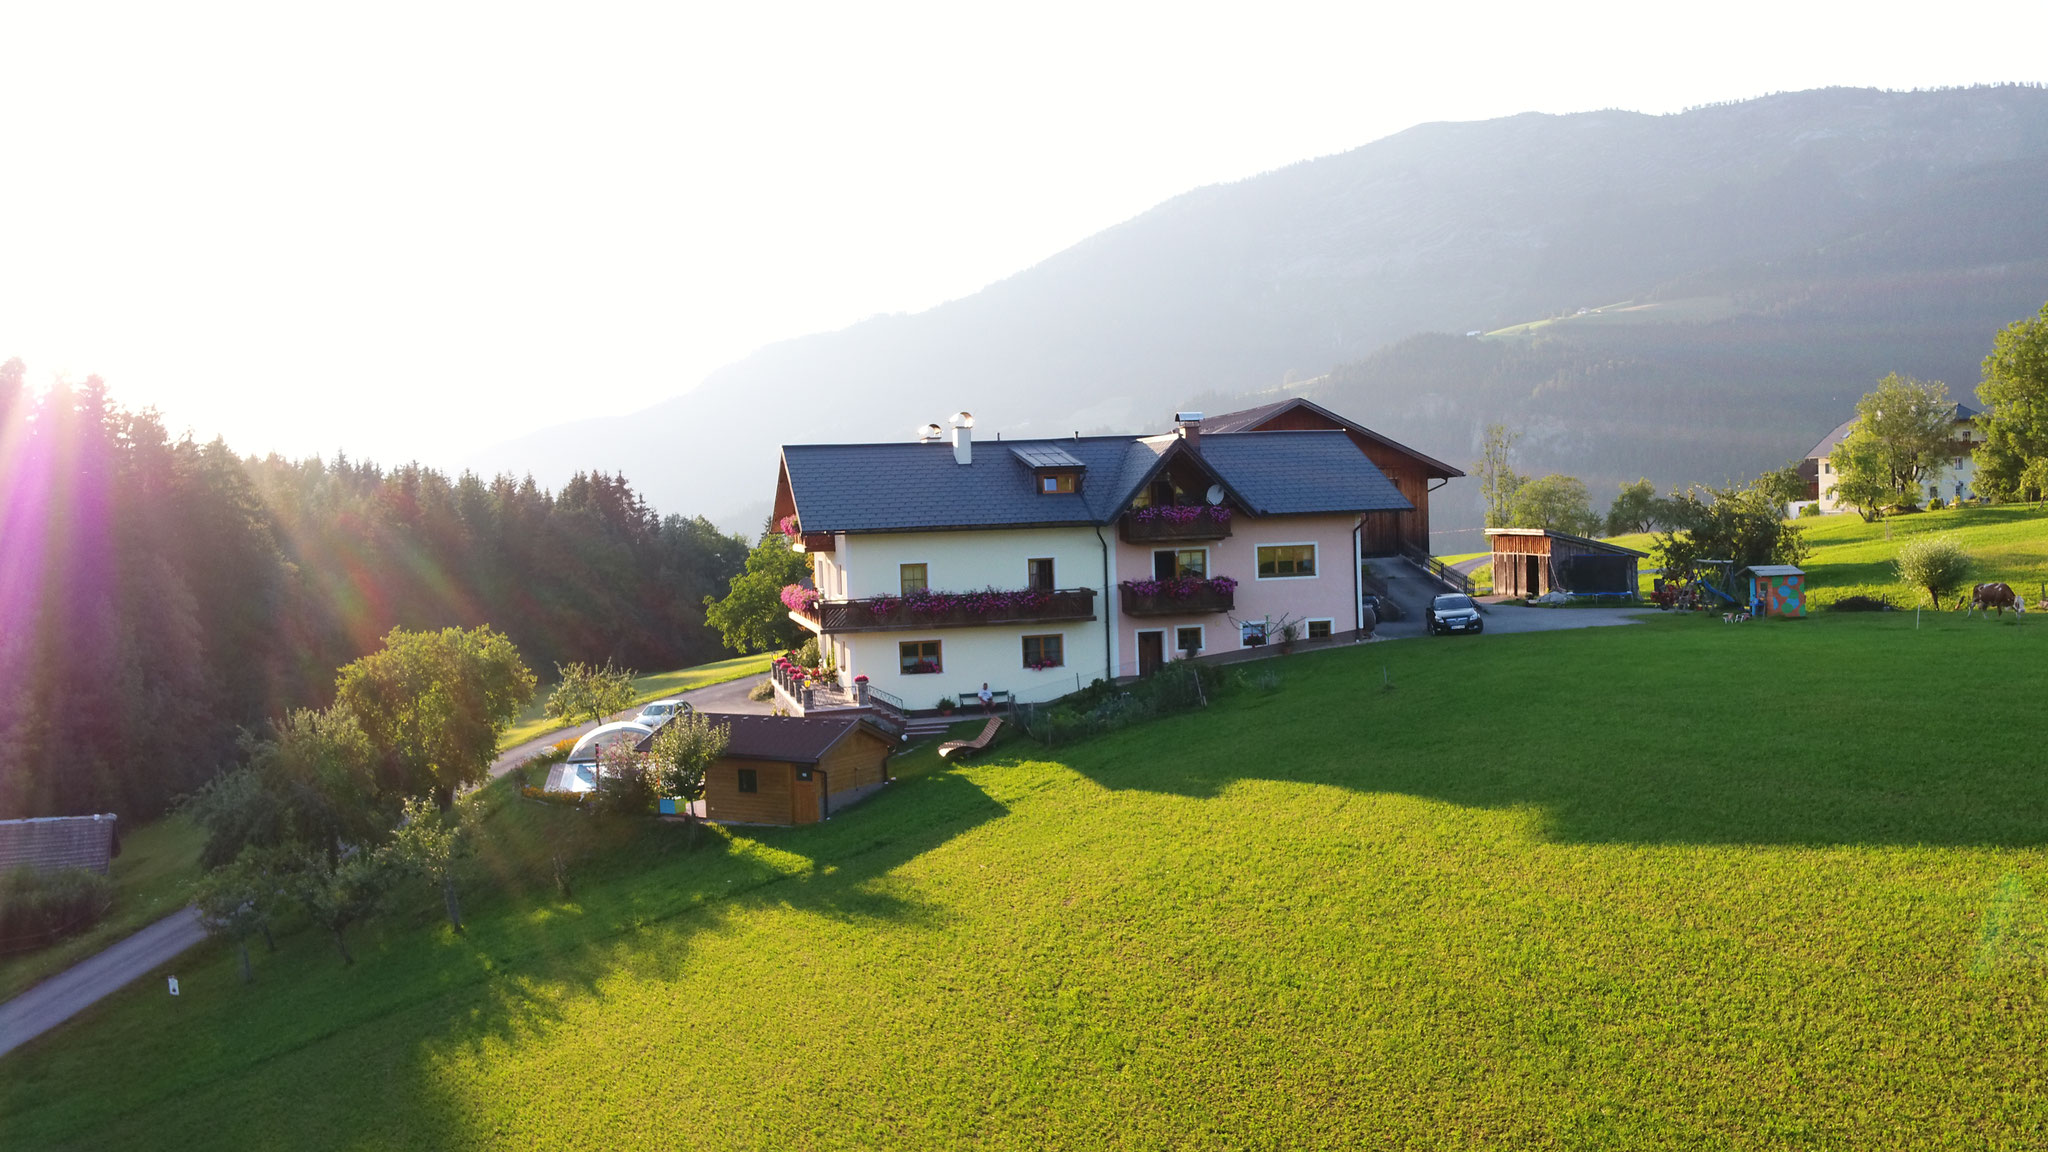 Biohof Haus Wieser, Abtenau, Salzburg Land,